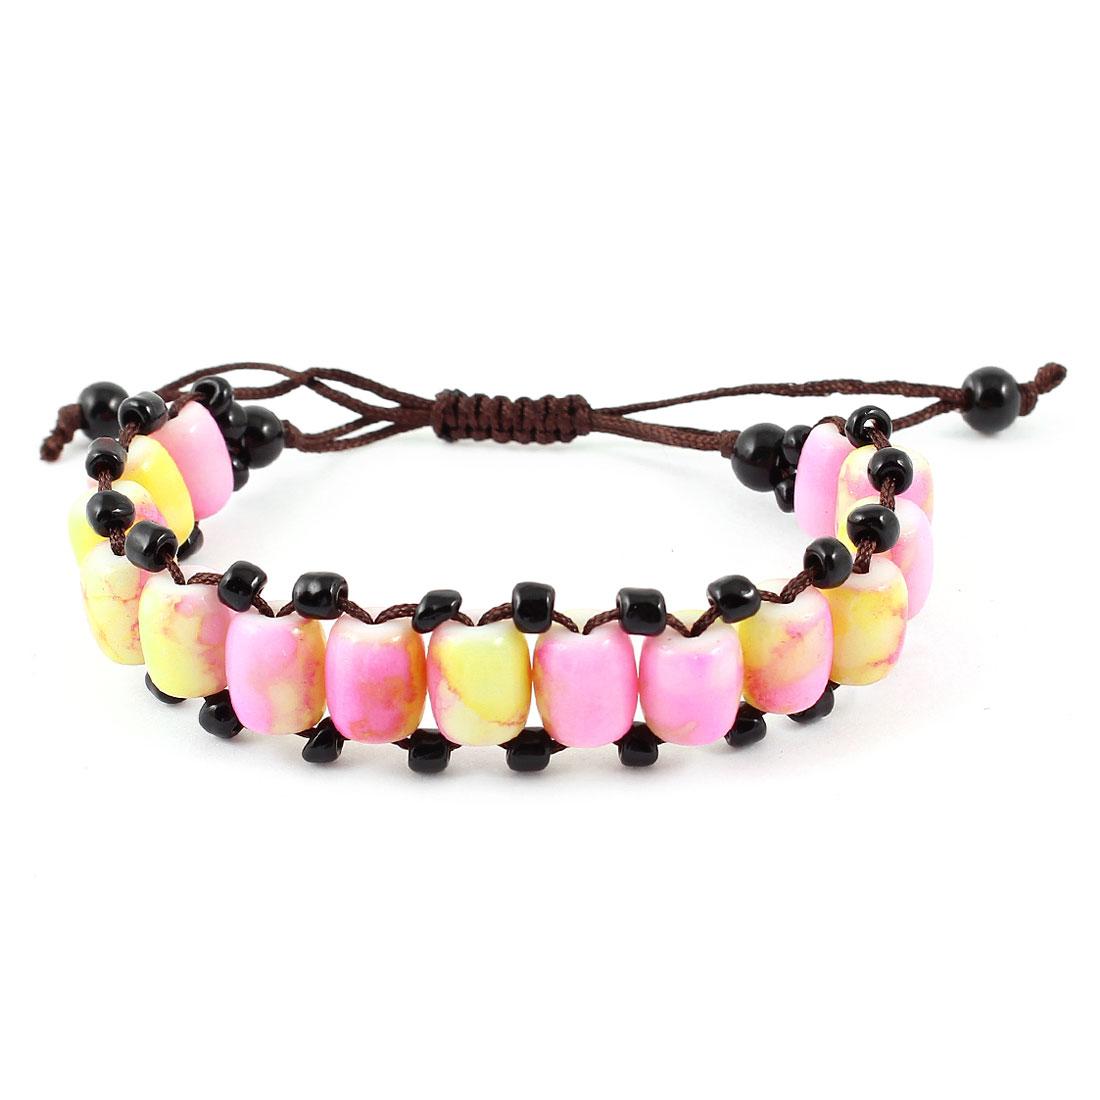 Lady Handmade Nylon Rope Pink Yellow Plastic Beads Decor Pull String Wrist Bracelet